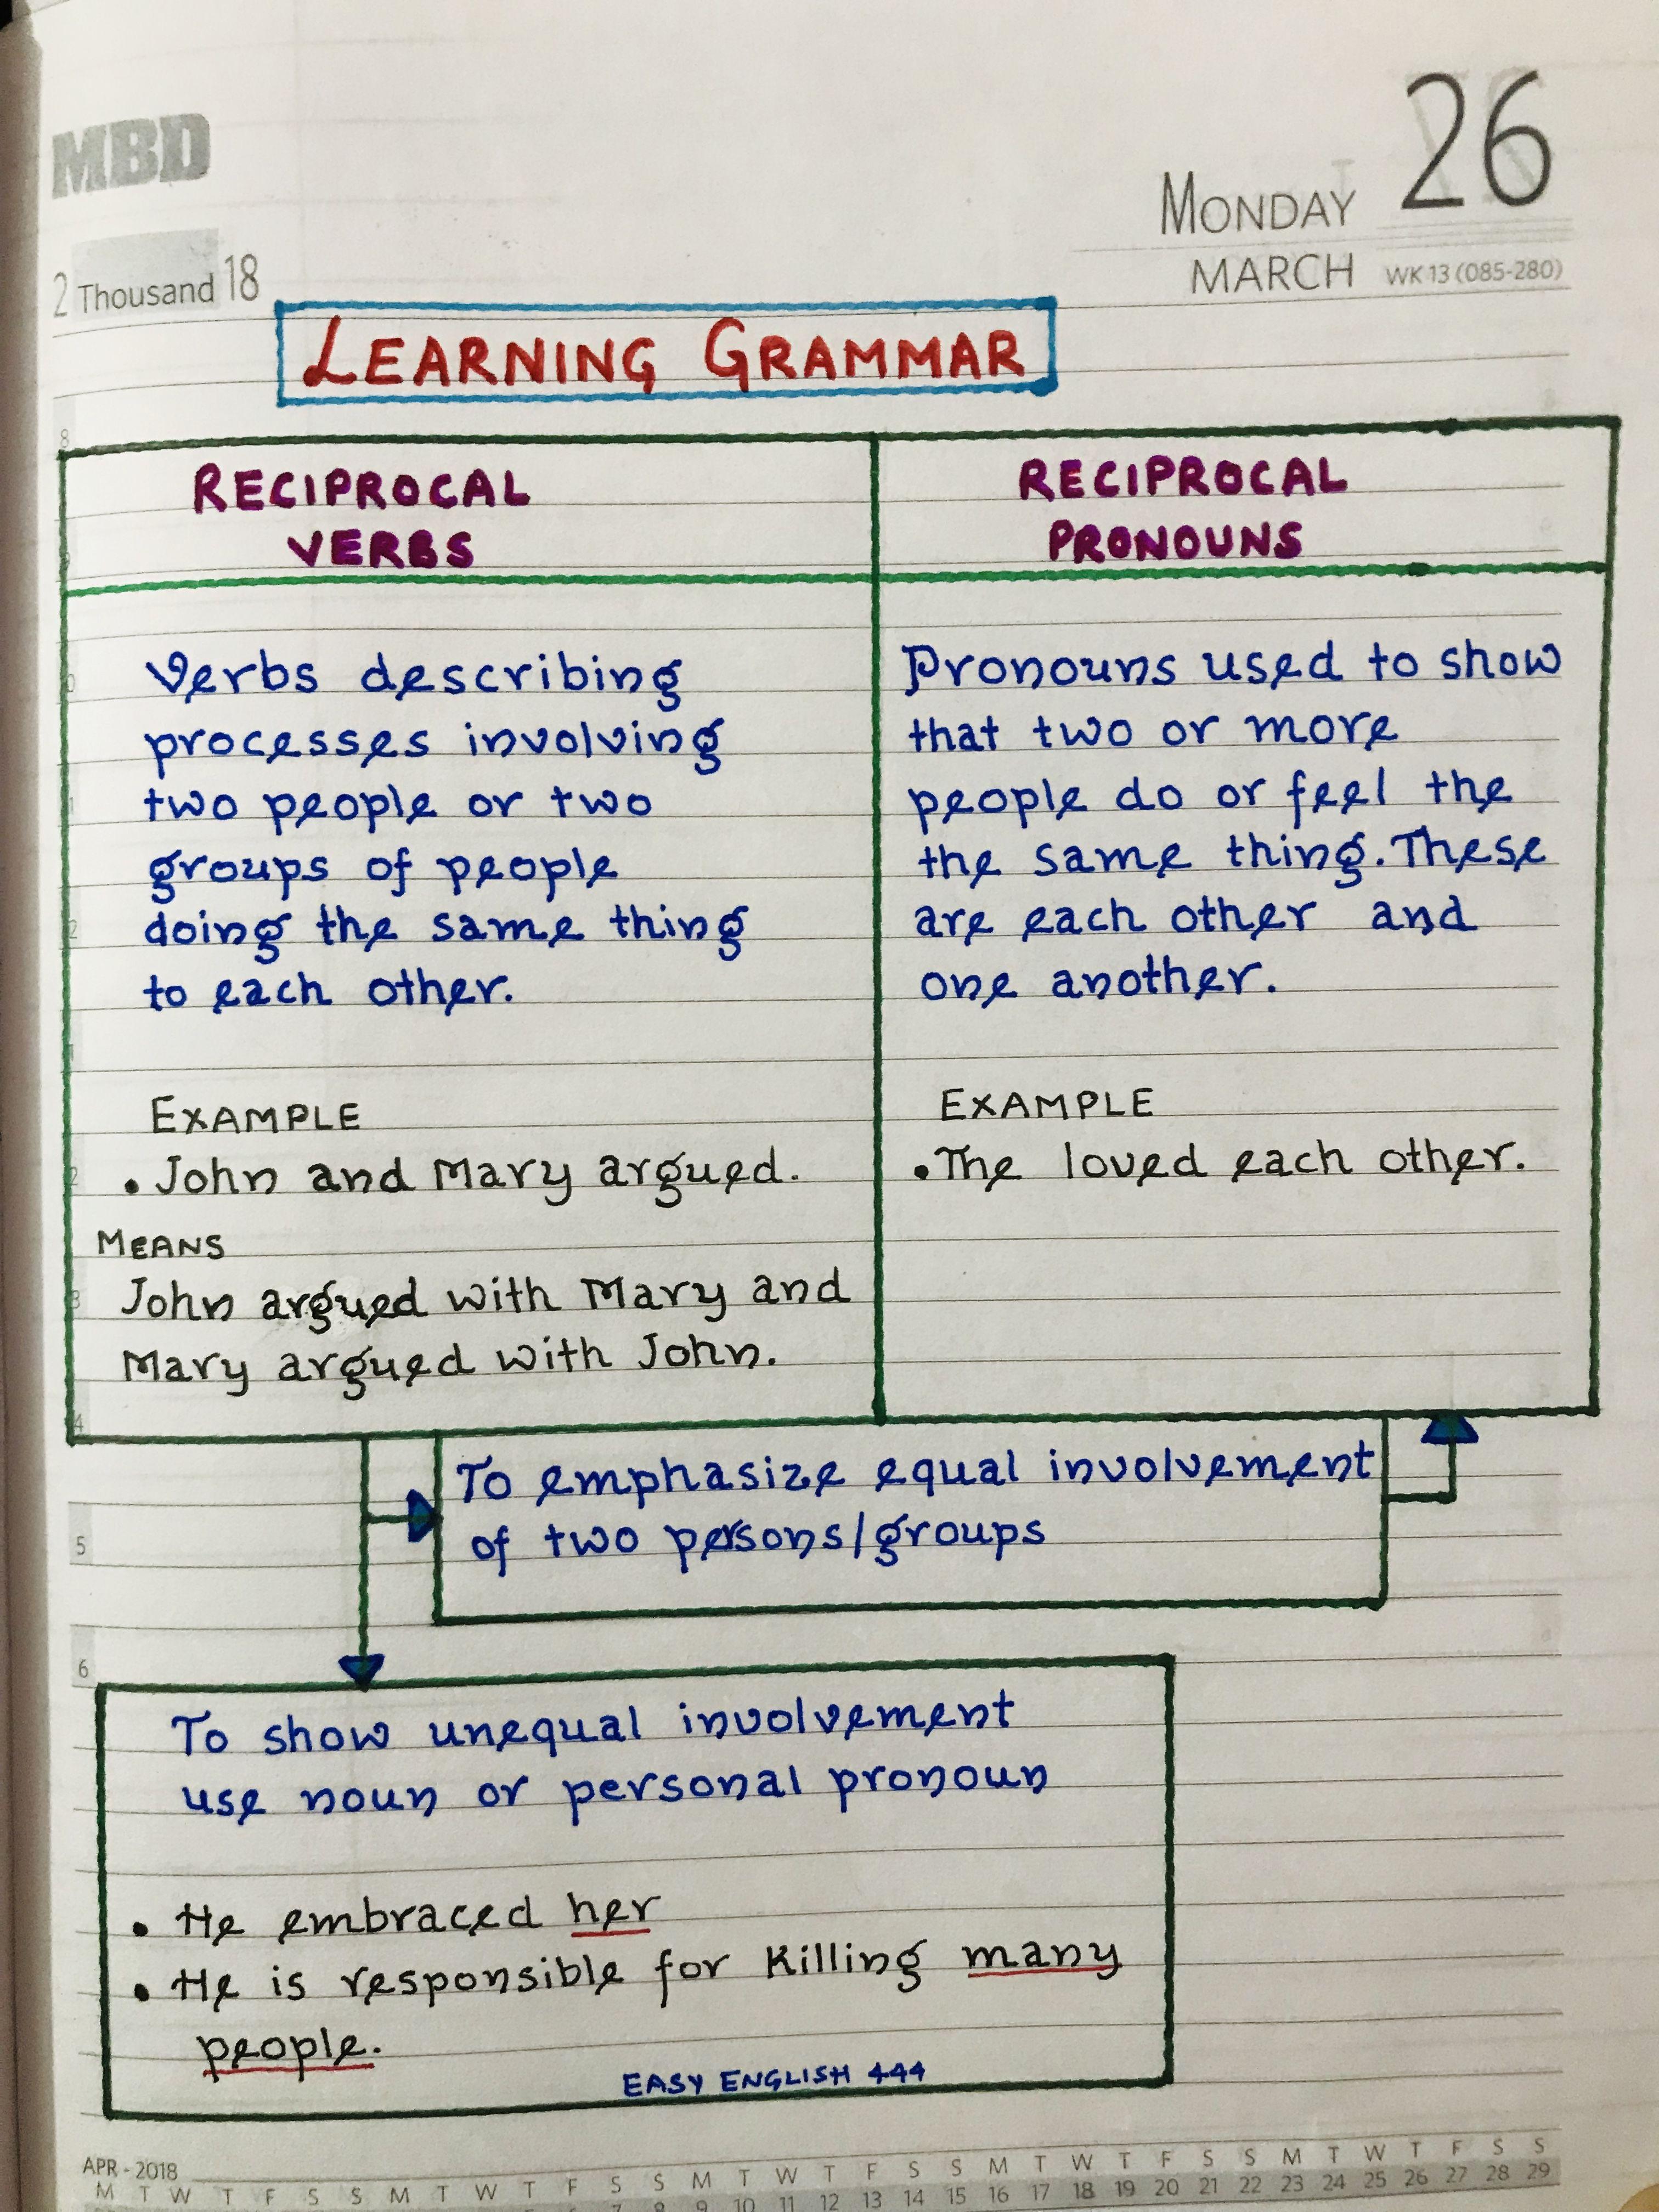 English Grammar Grammar English Learning